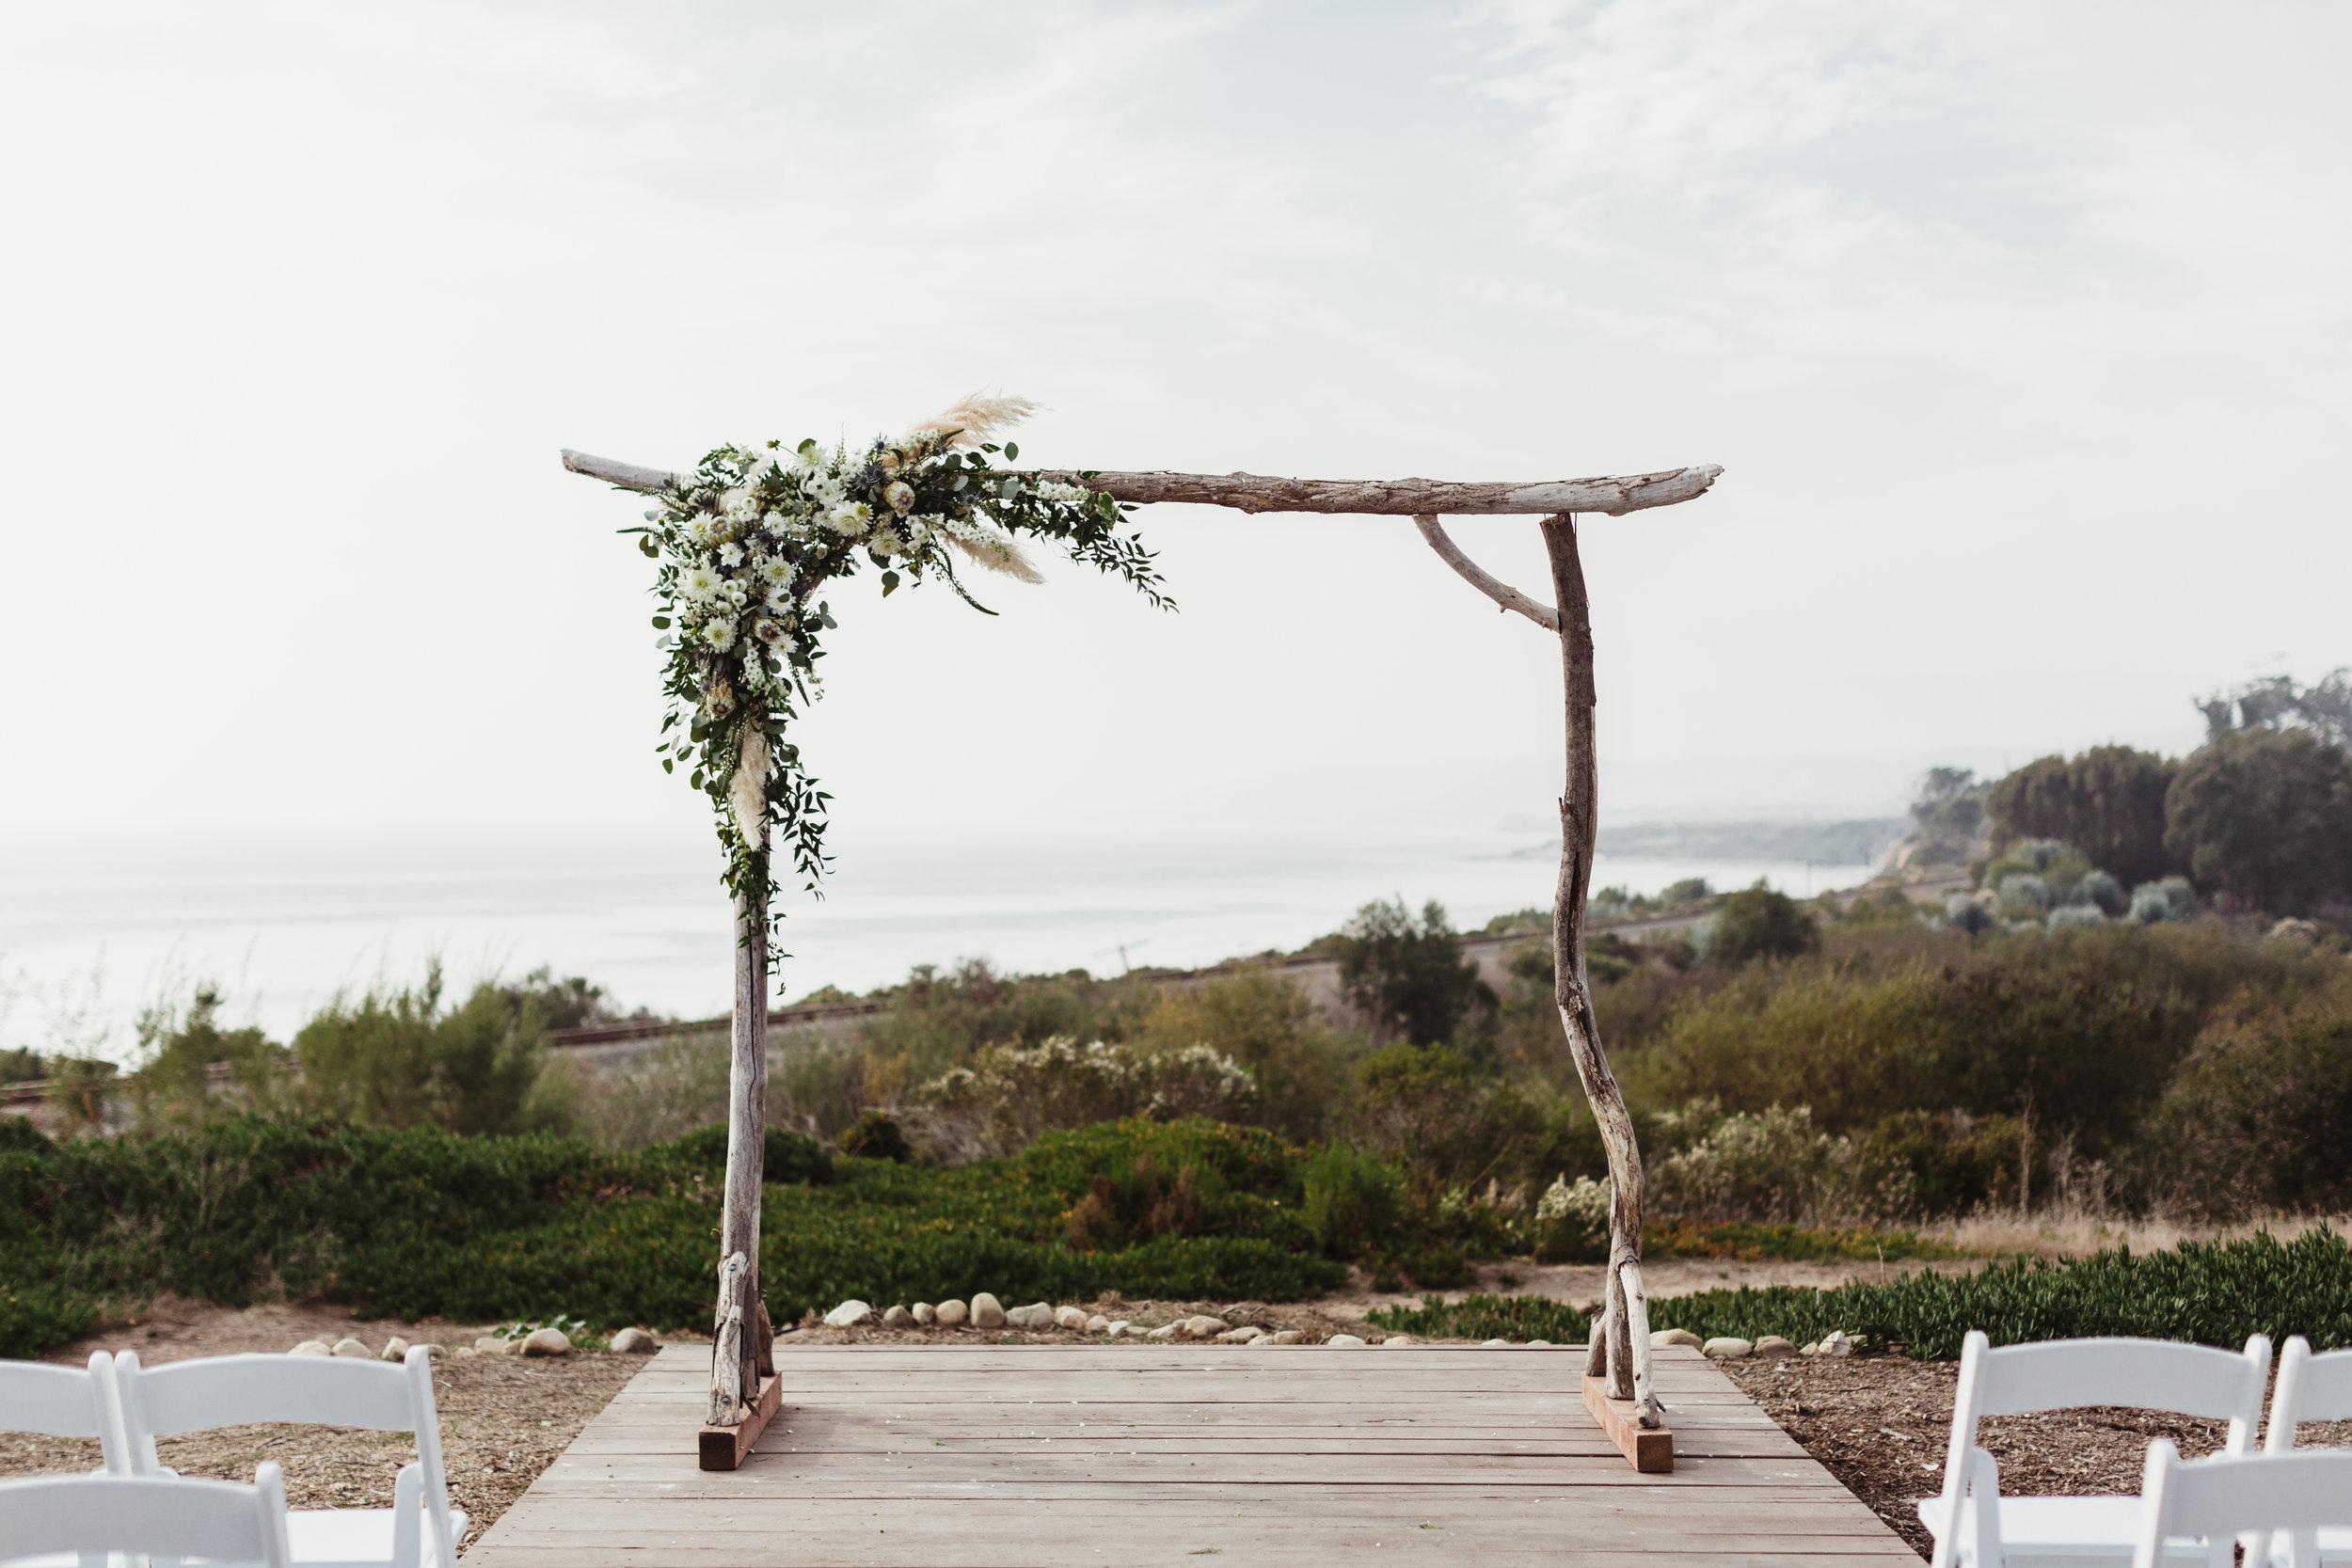 Jamie_English_Photography_JordanErik_Dos_Pueblos_Orchid_Wedding_Santa_Barbara_Fall2018-268.jpg